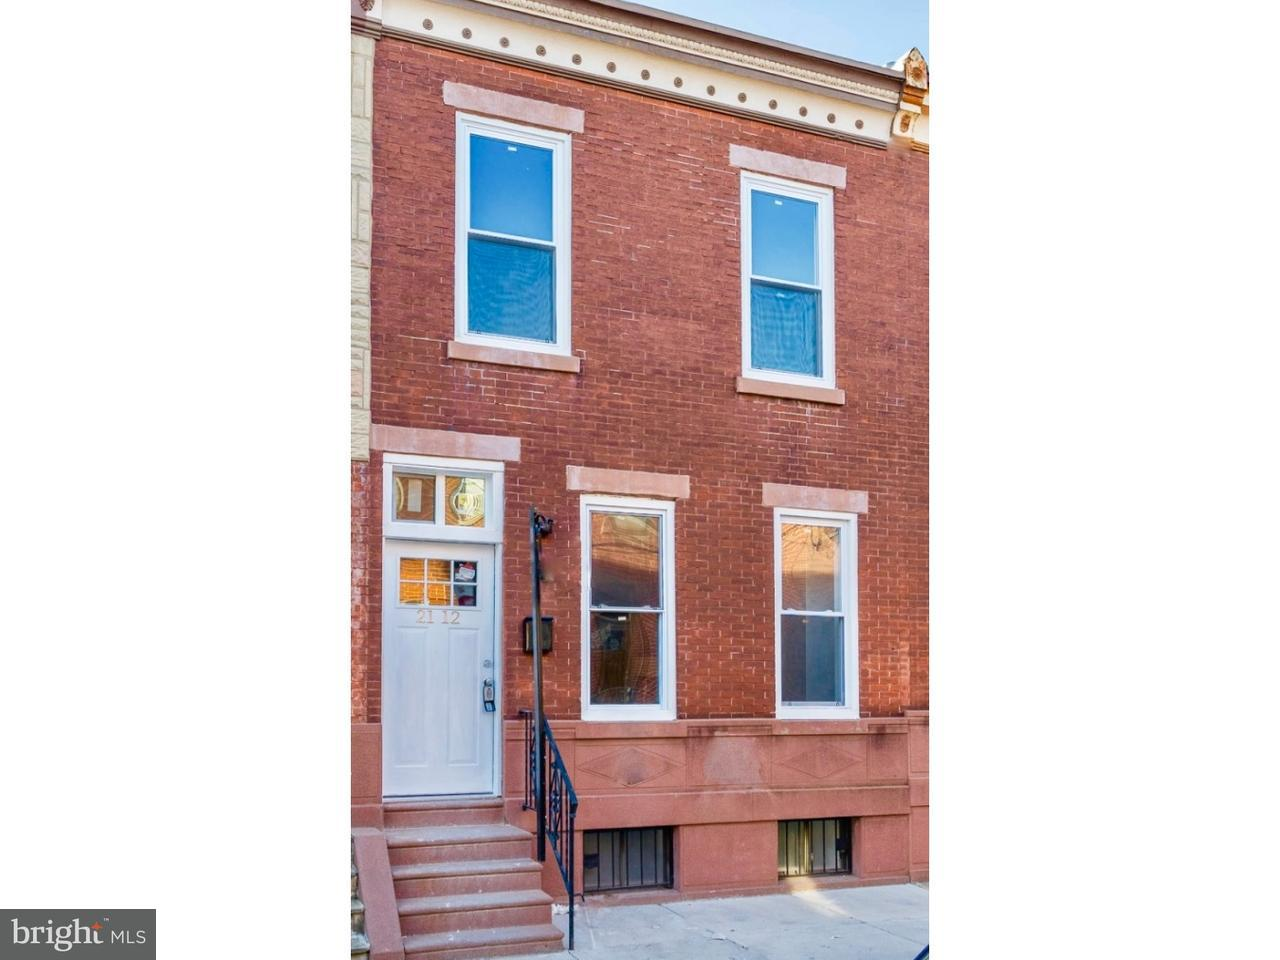 2112 S Bouvier Philadelphia, PA 19145